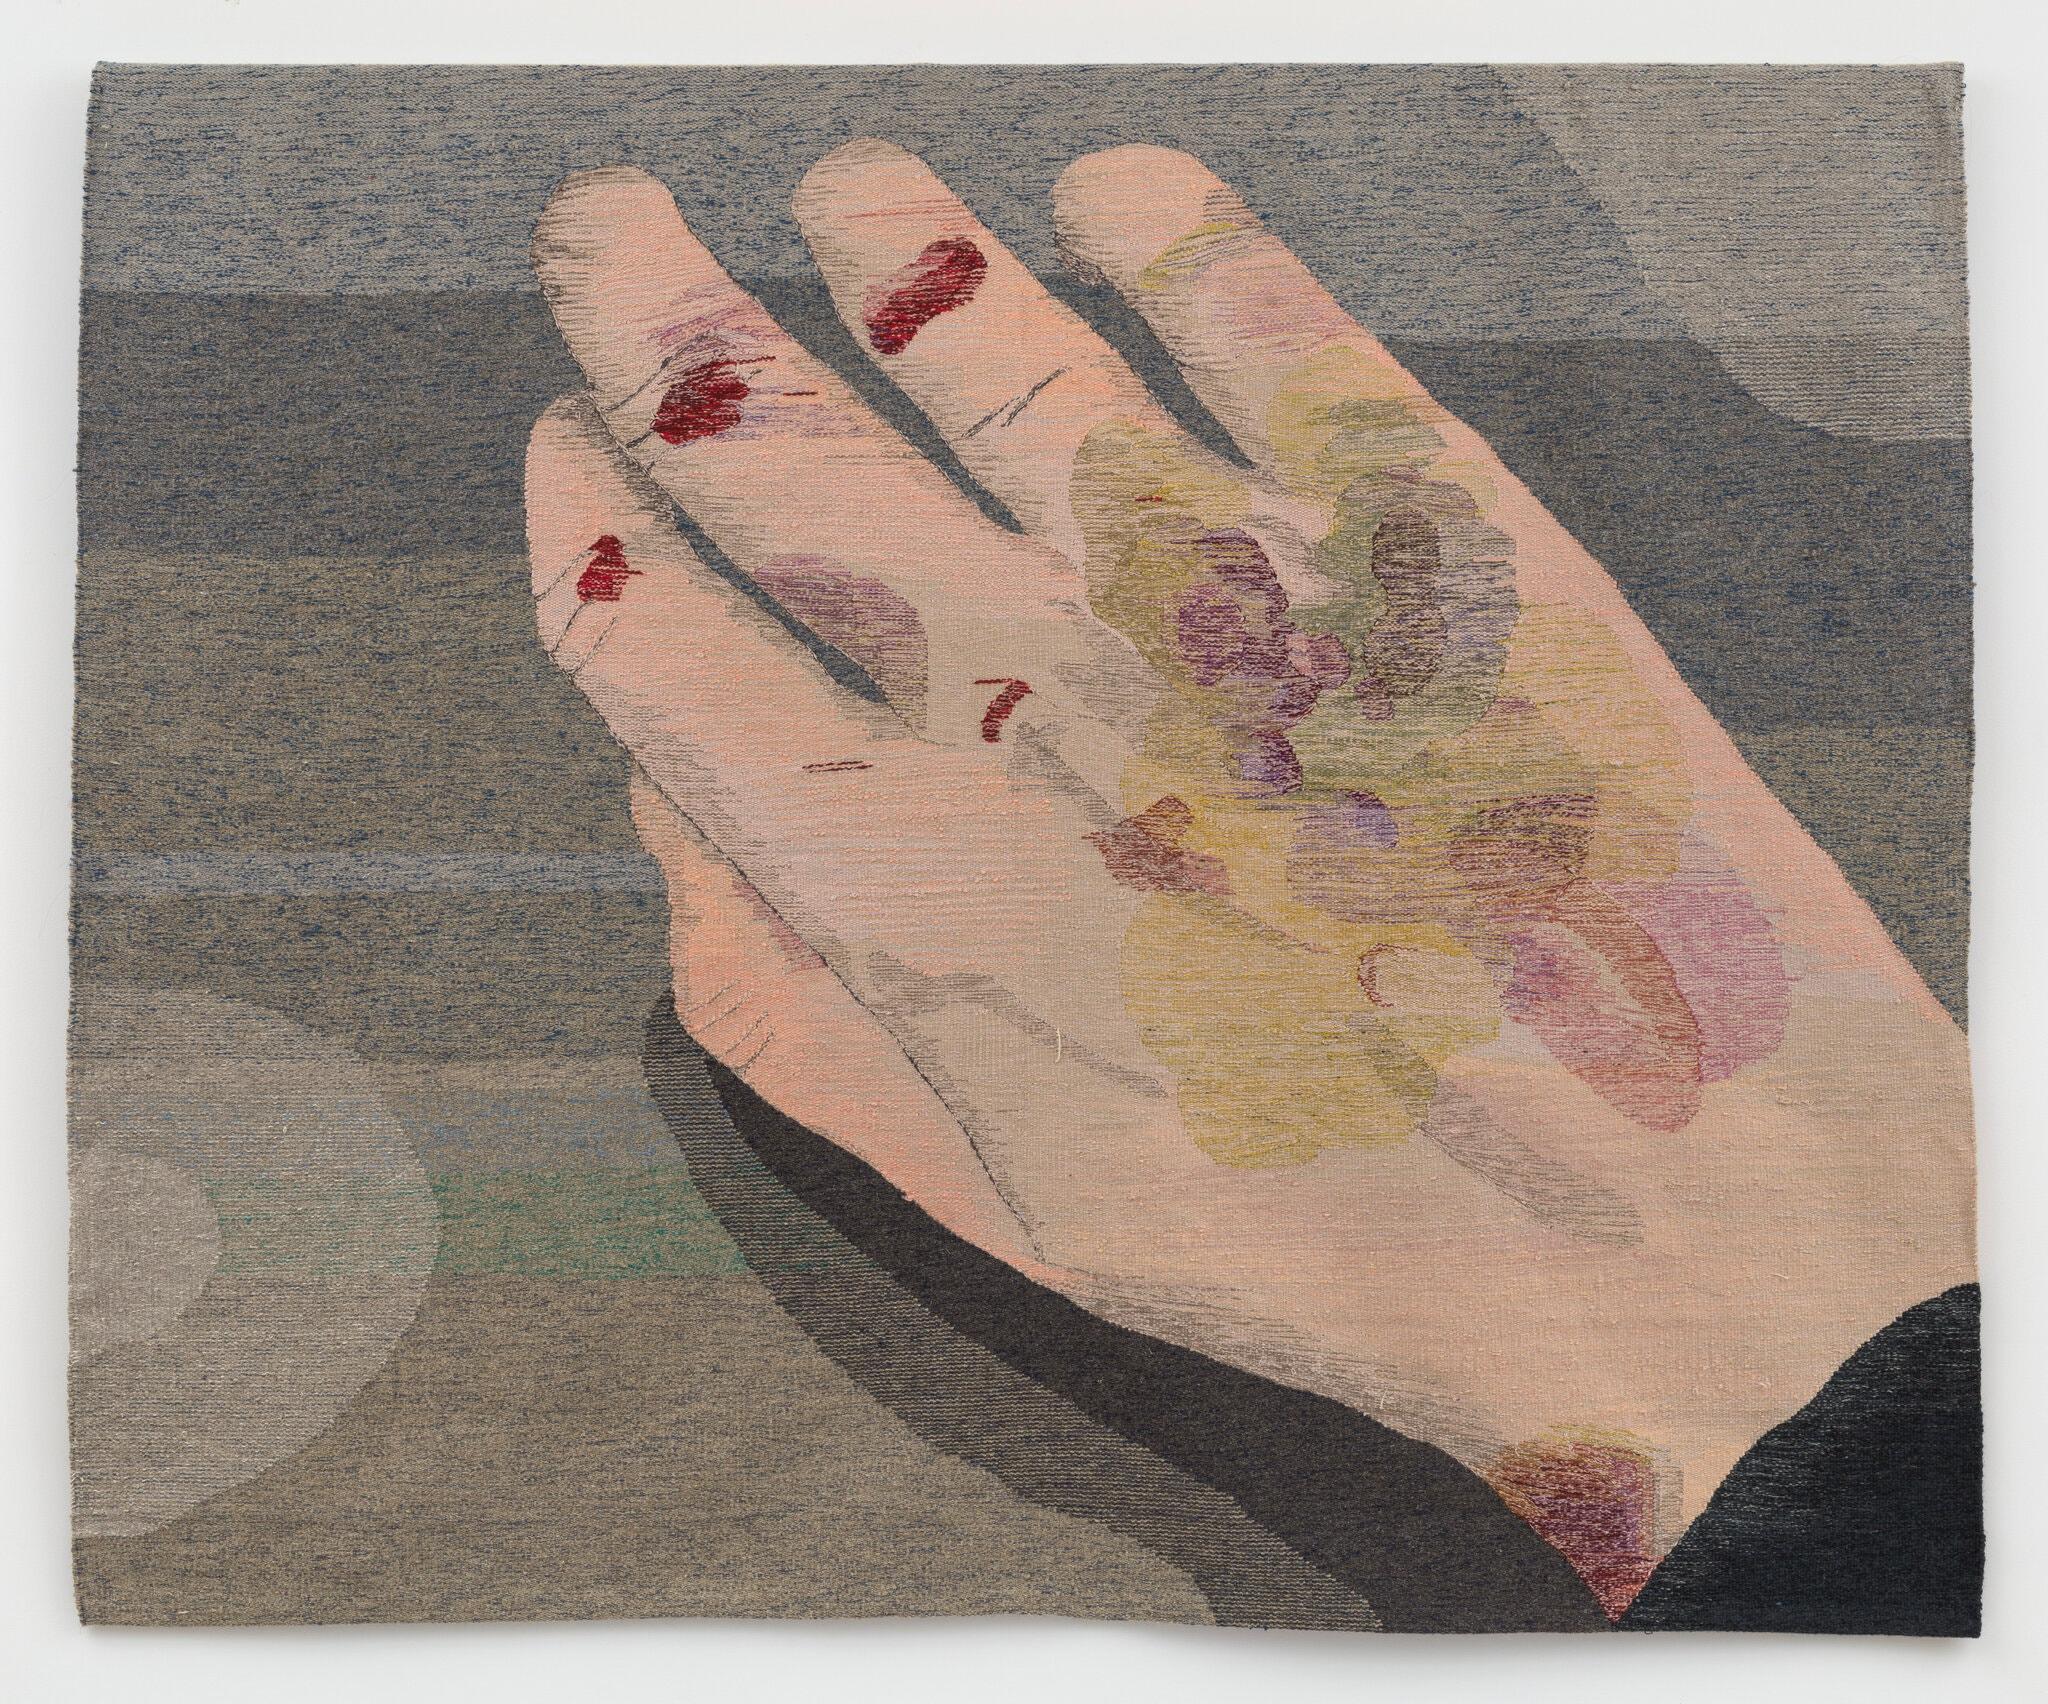 An Accident by MassArt alumna Erin M. Riley